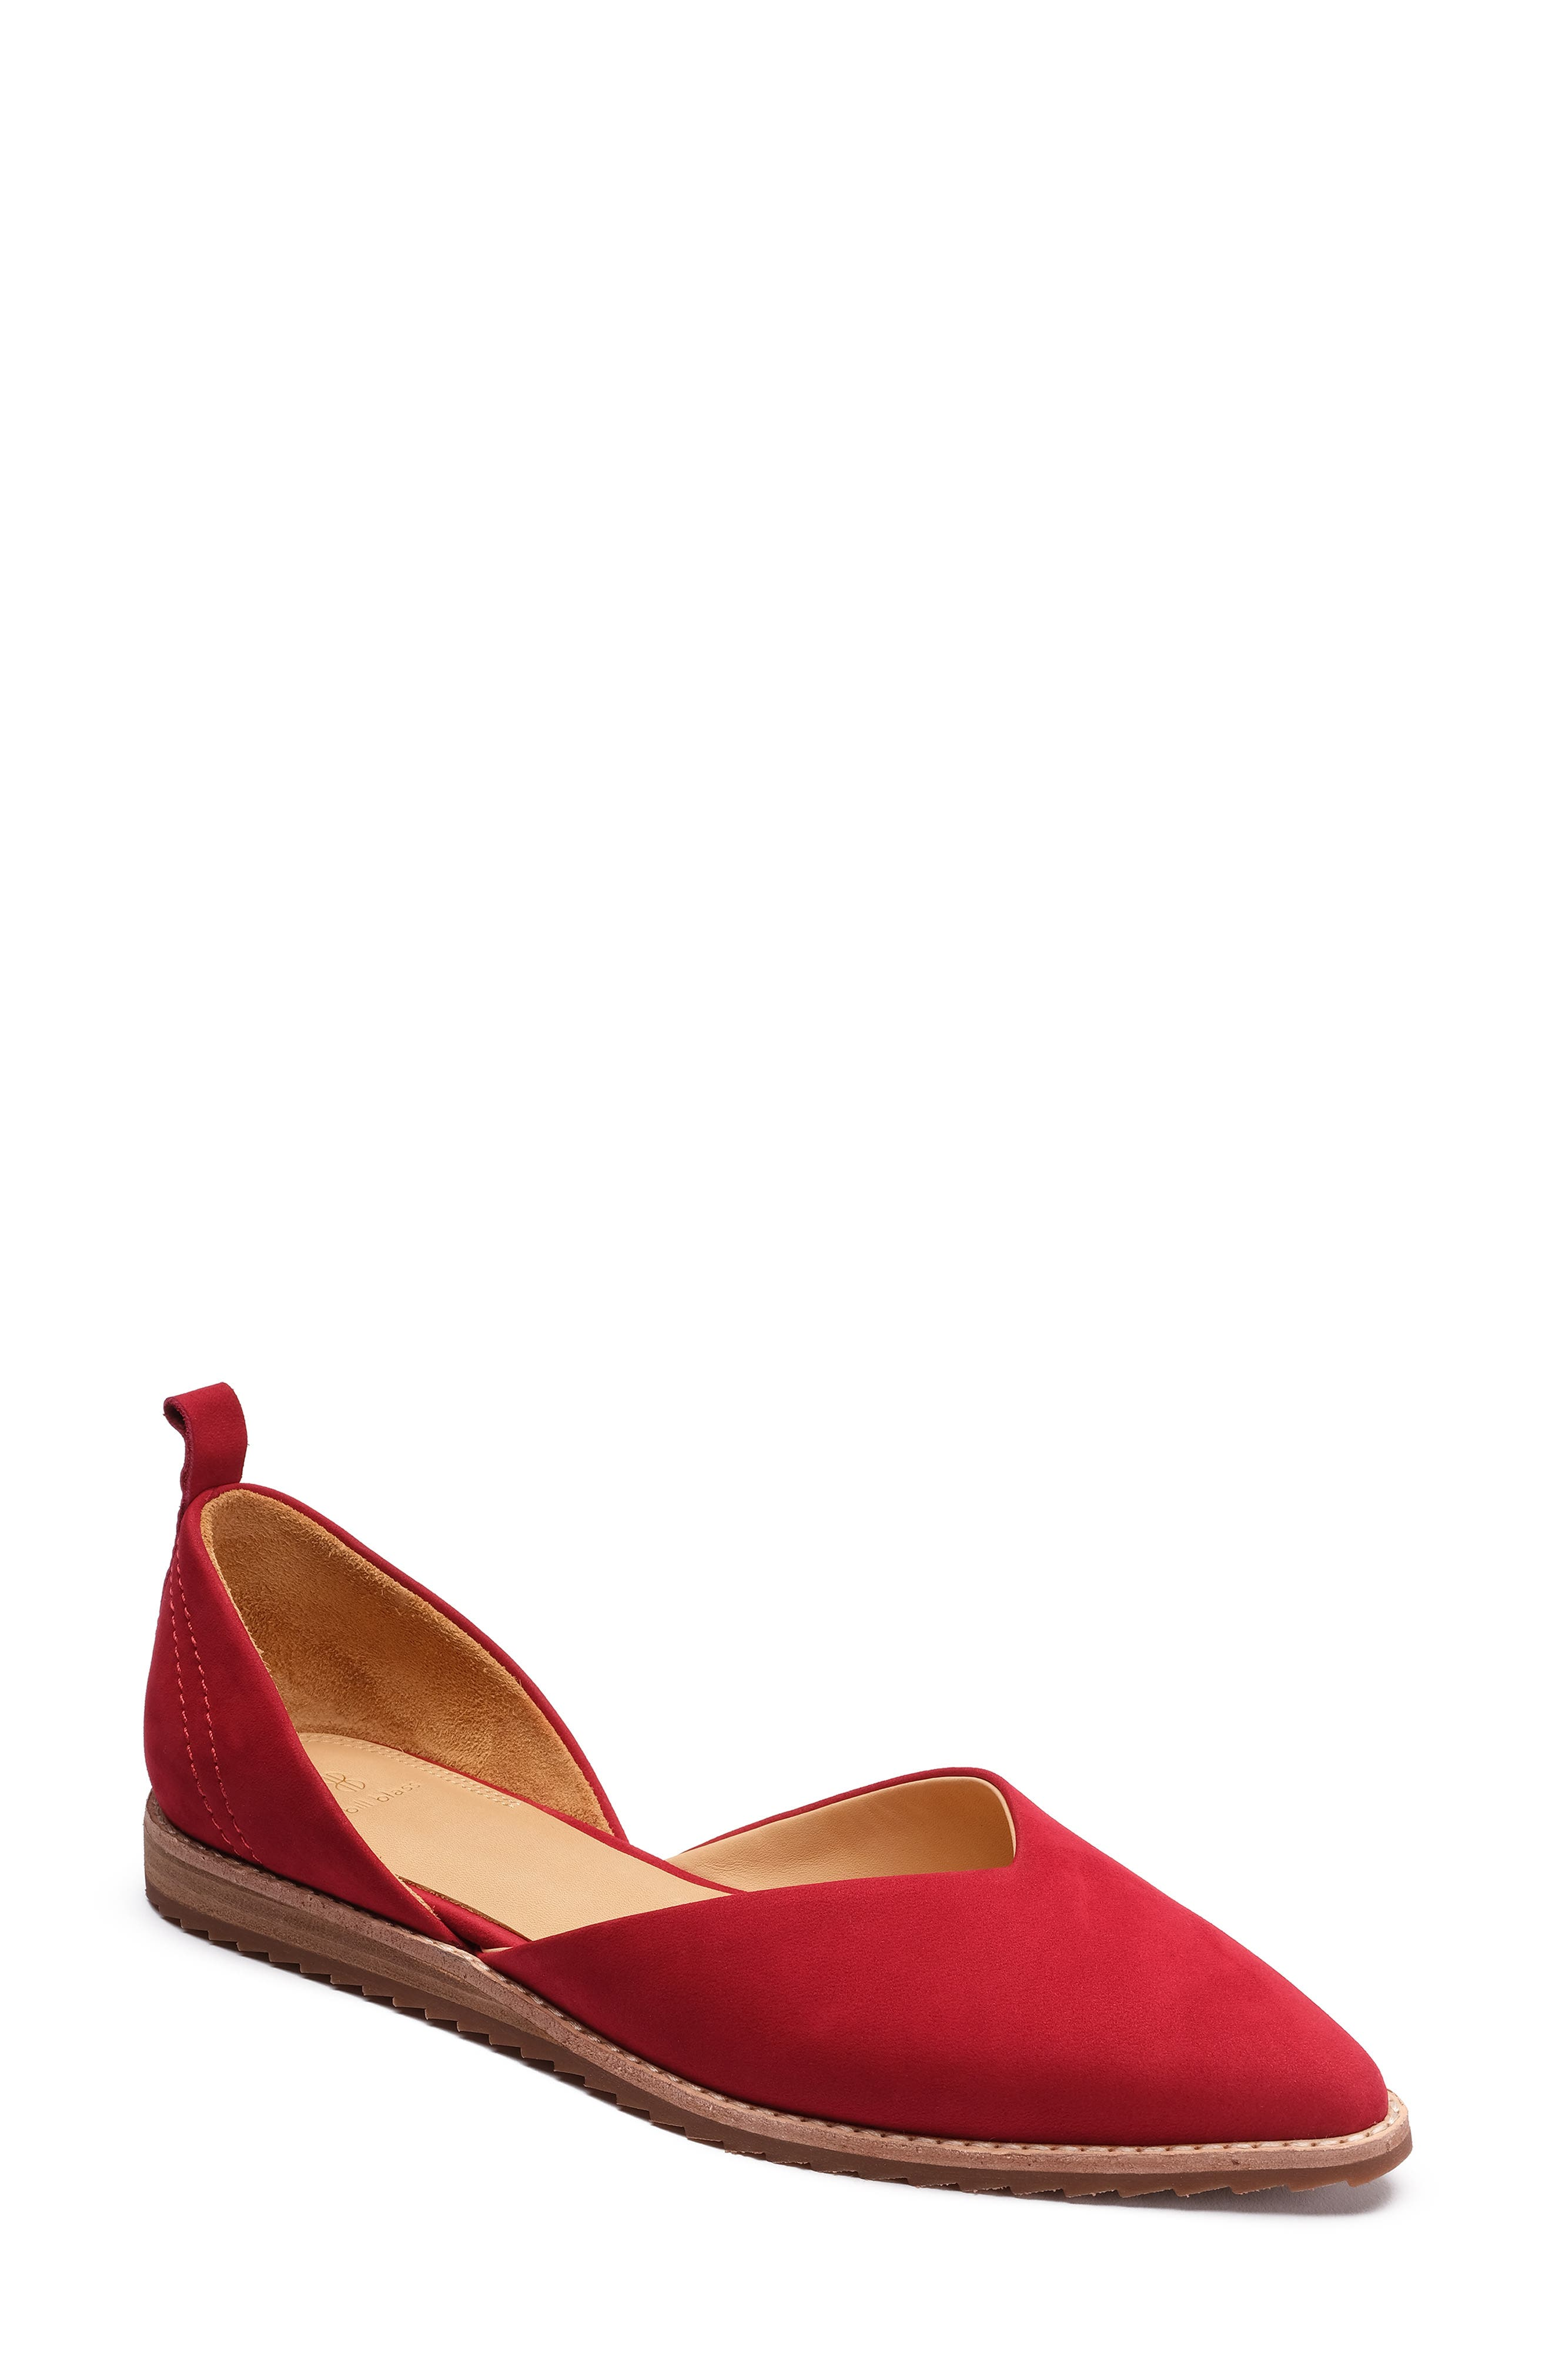 Bill Blass Sybil Pointy Toe Flat, Red